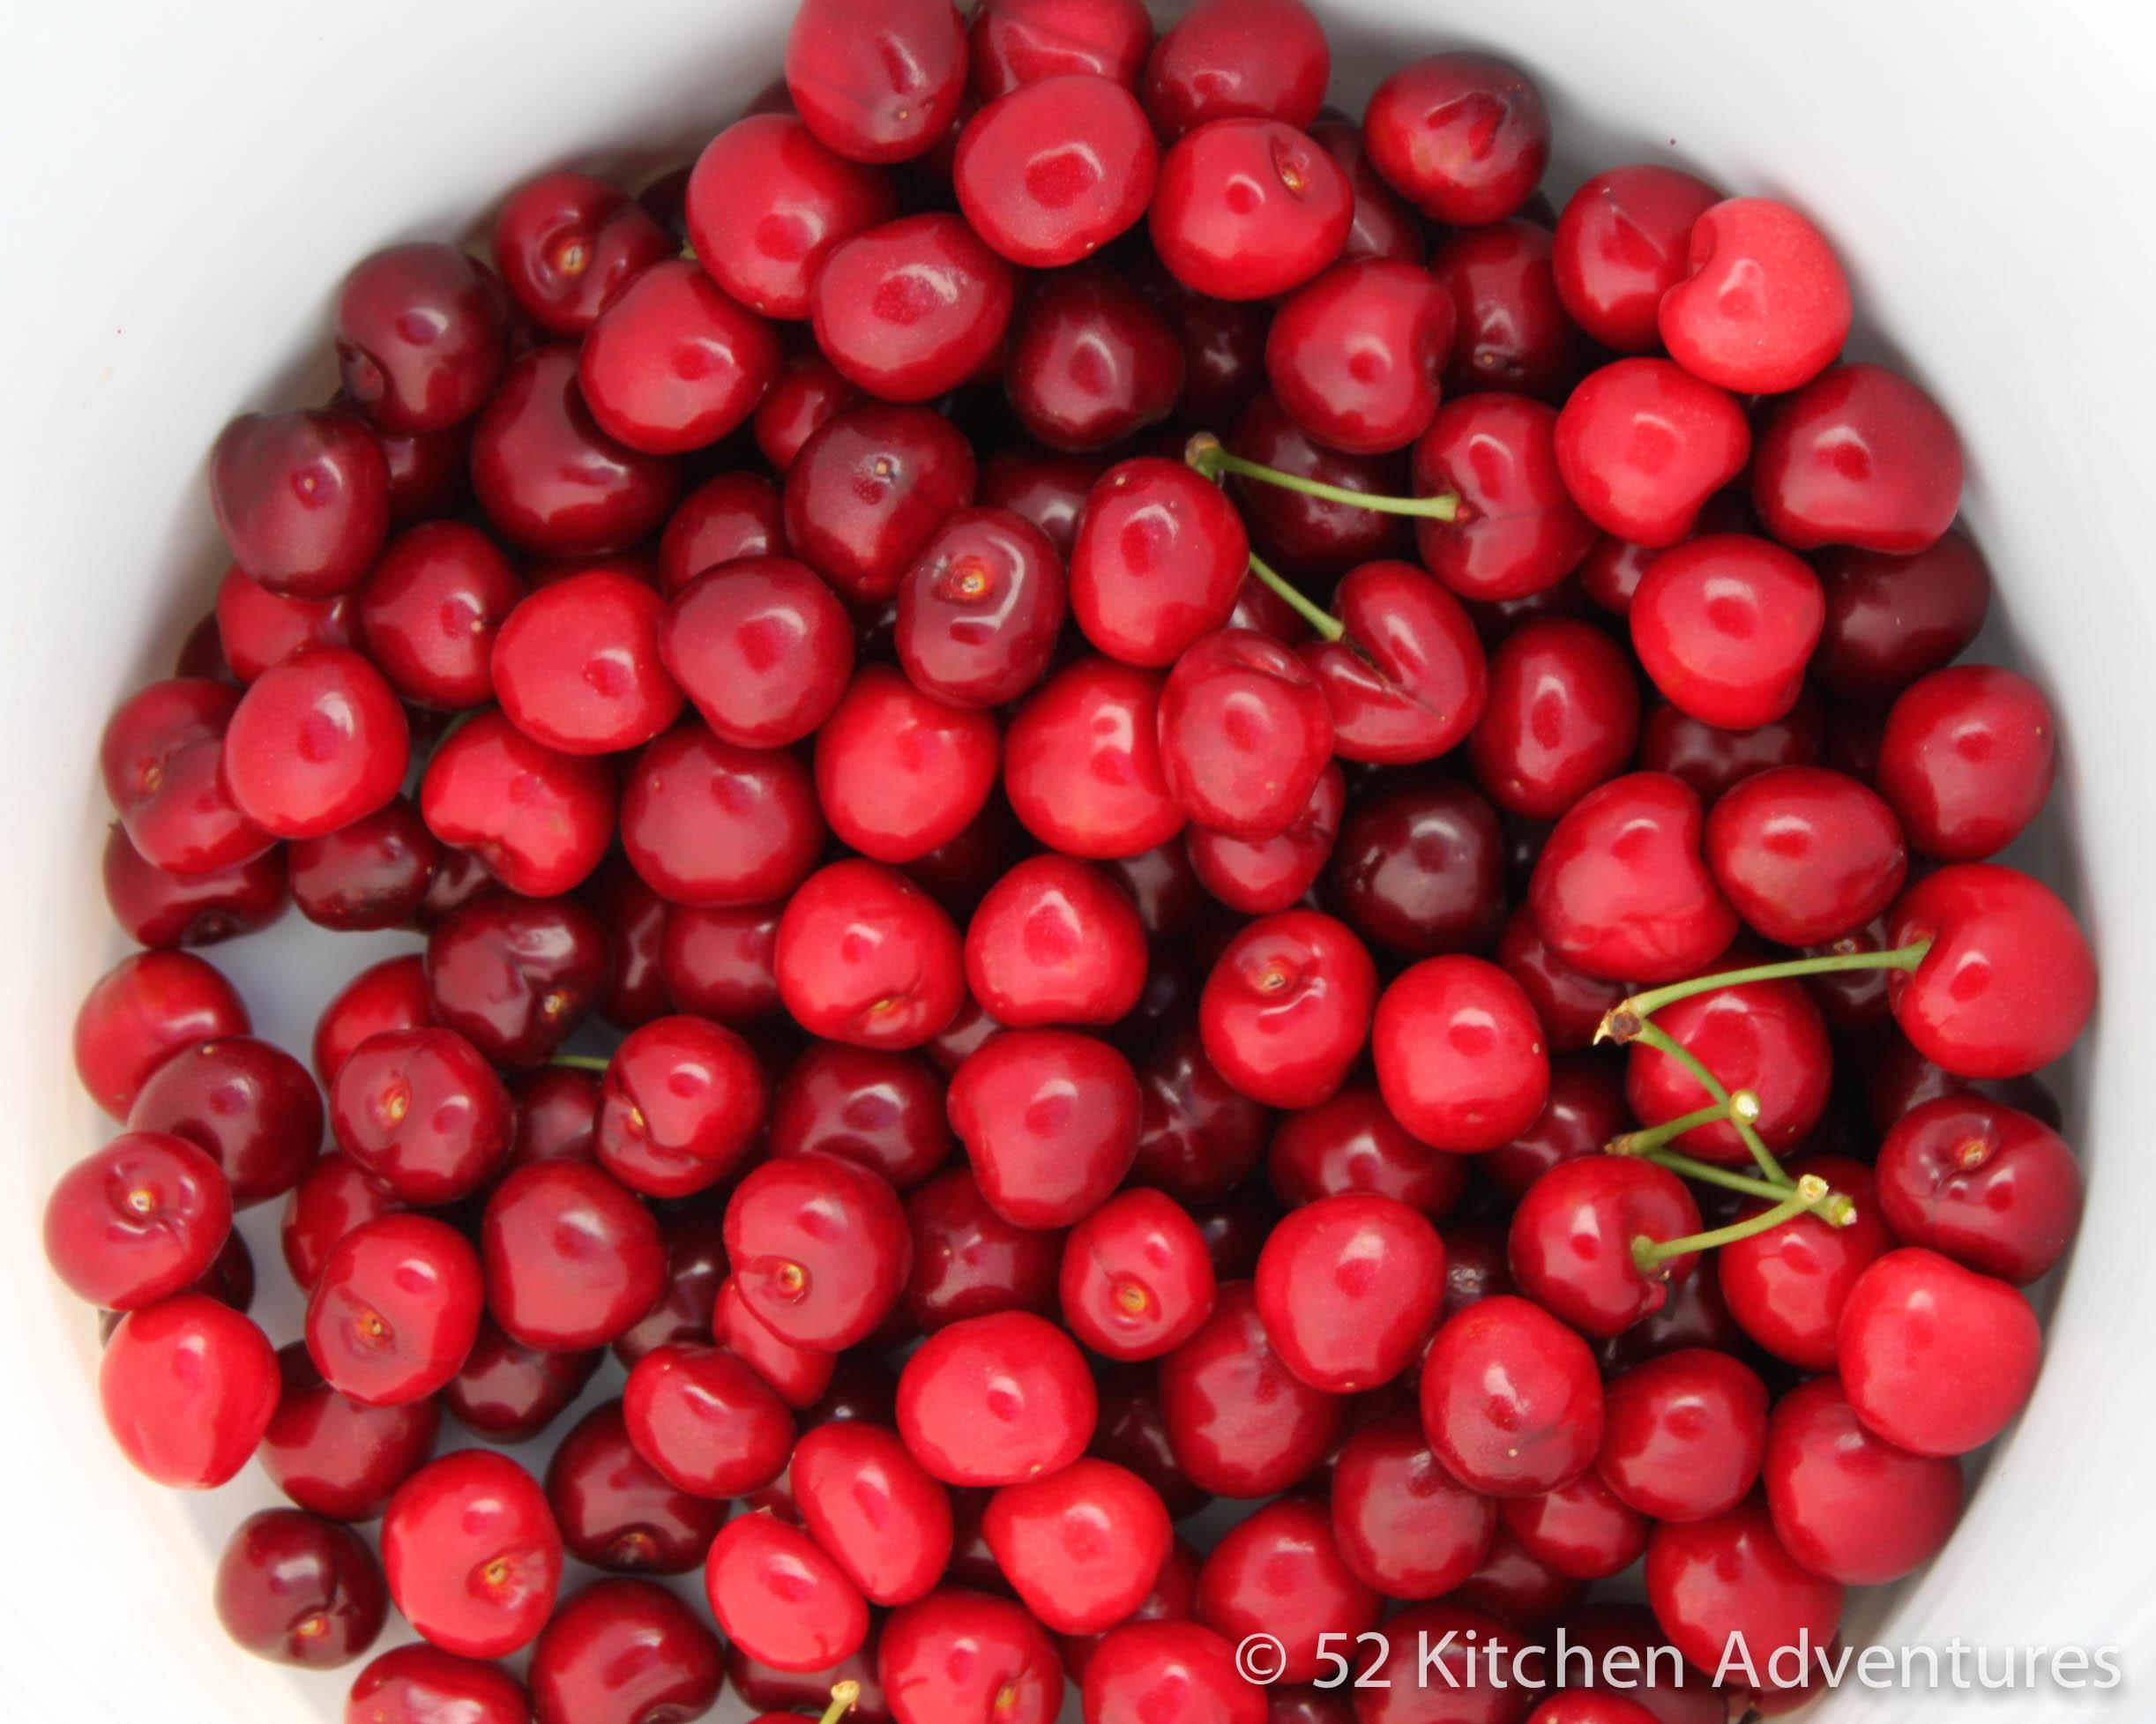 Salvador Family Farm Cherries